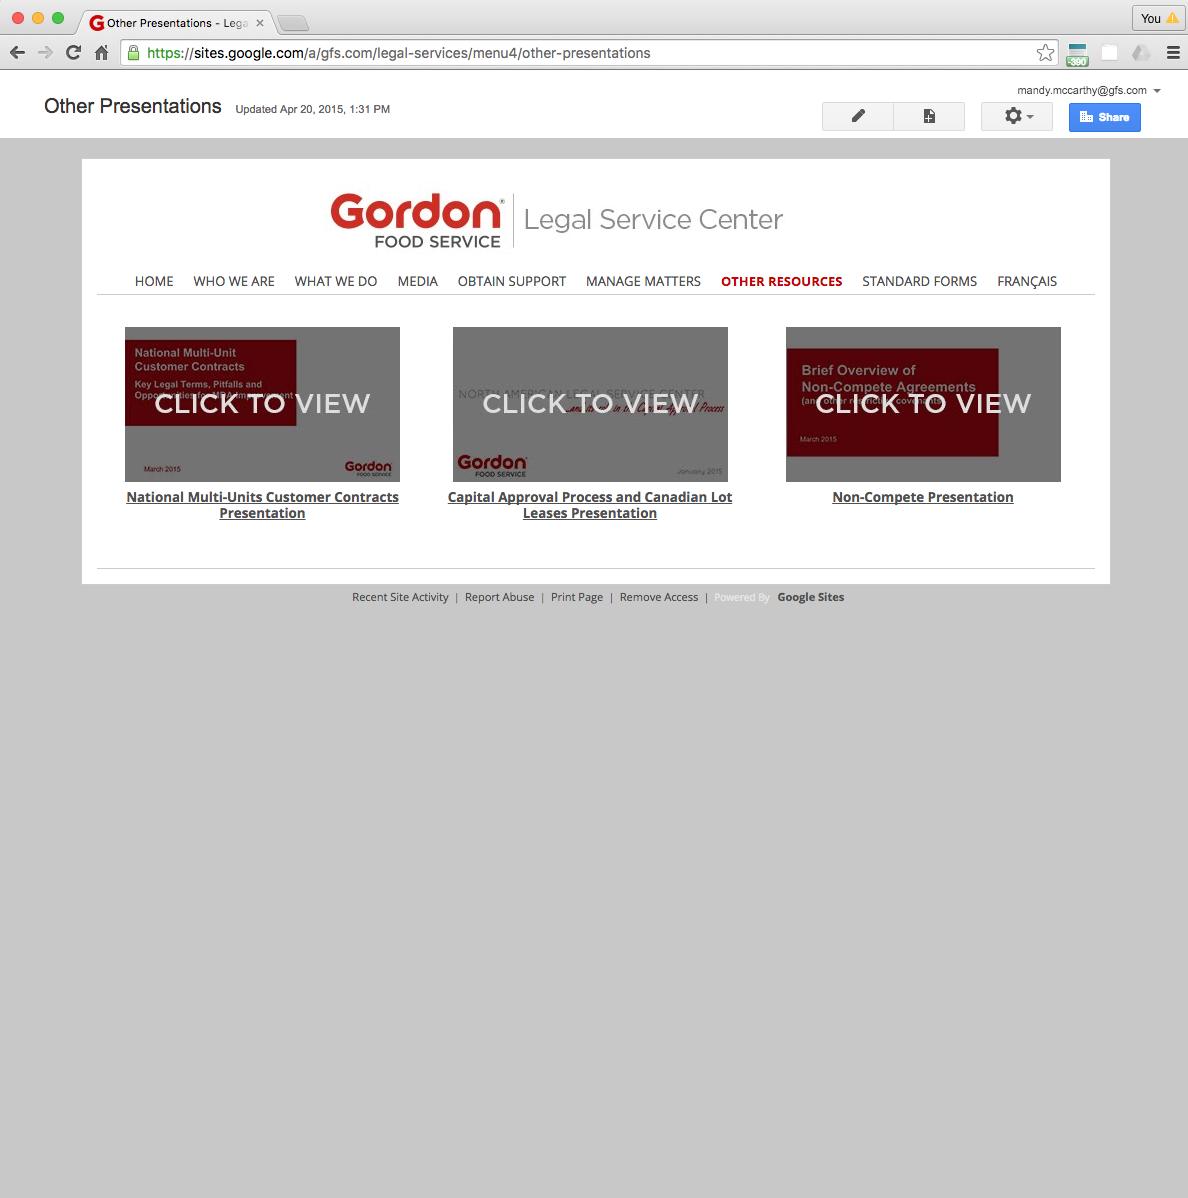 GS_Legal_Presentations.png